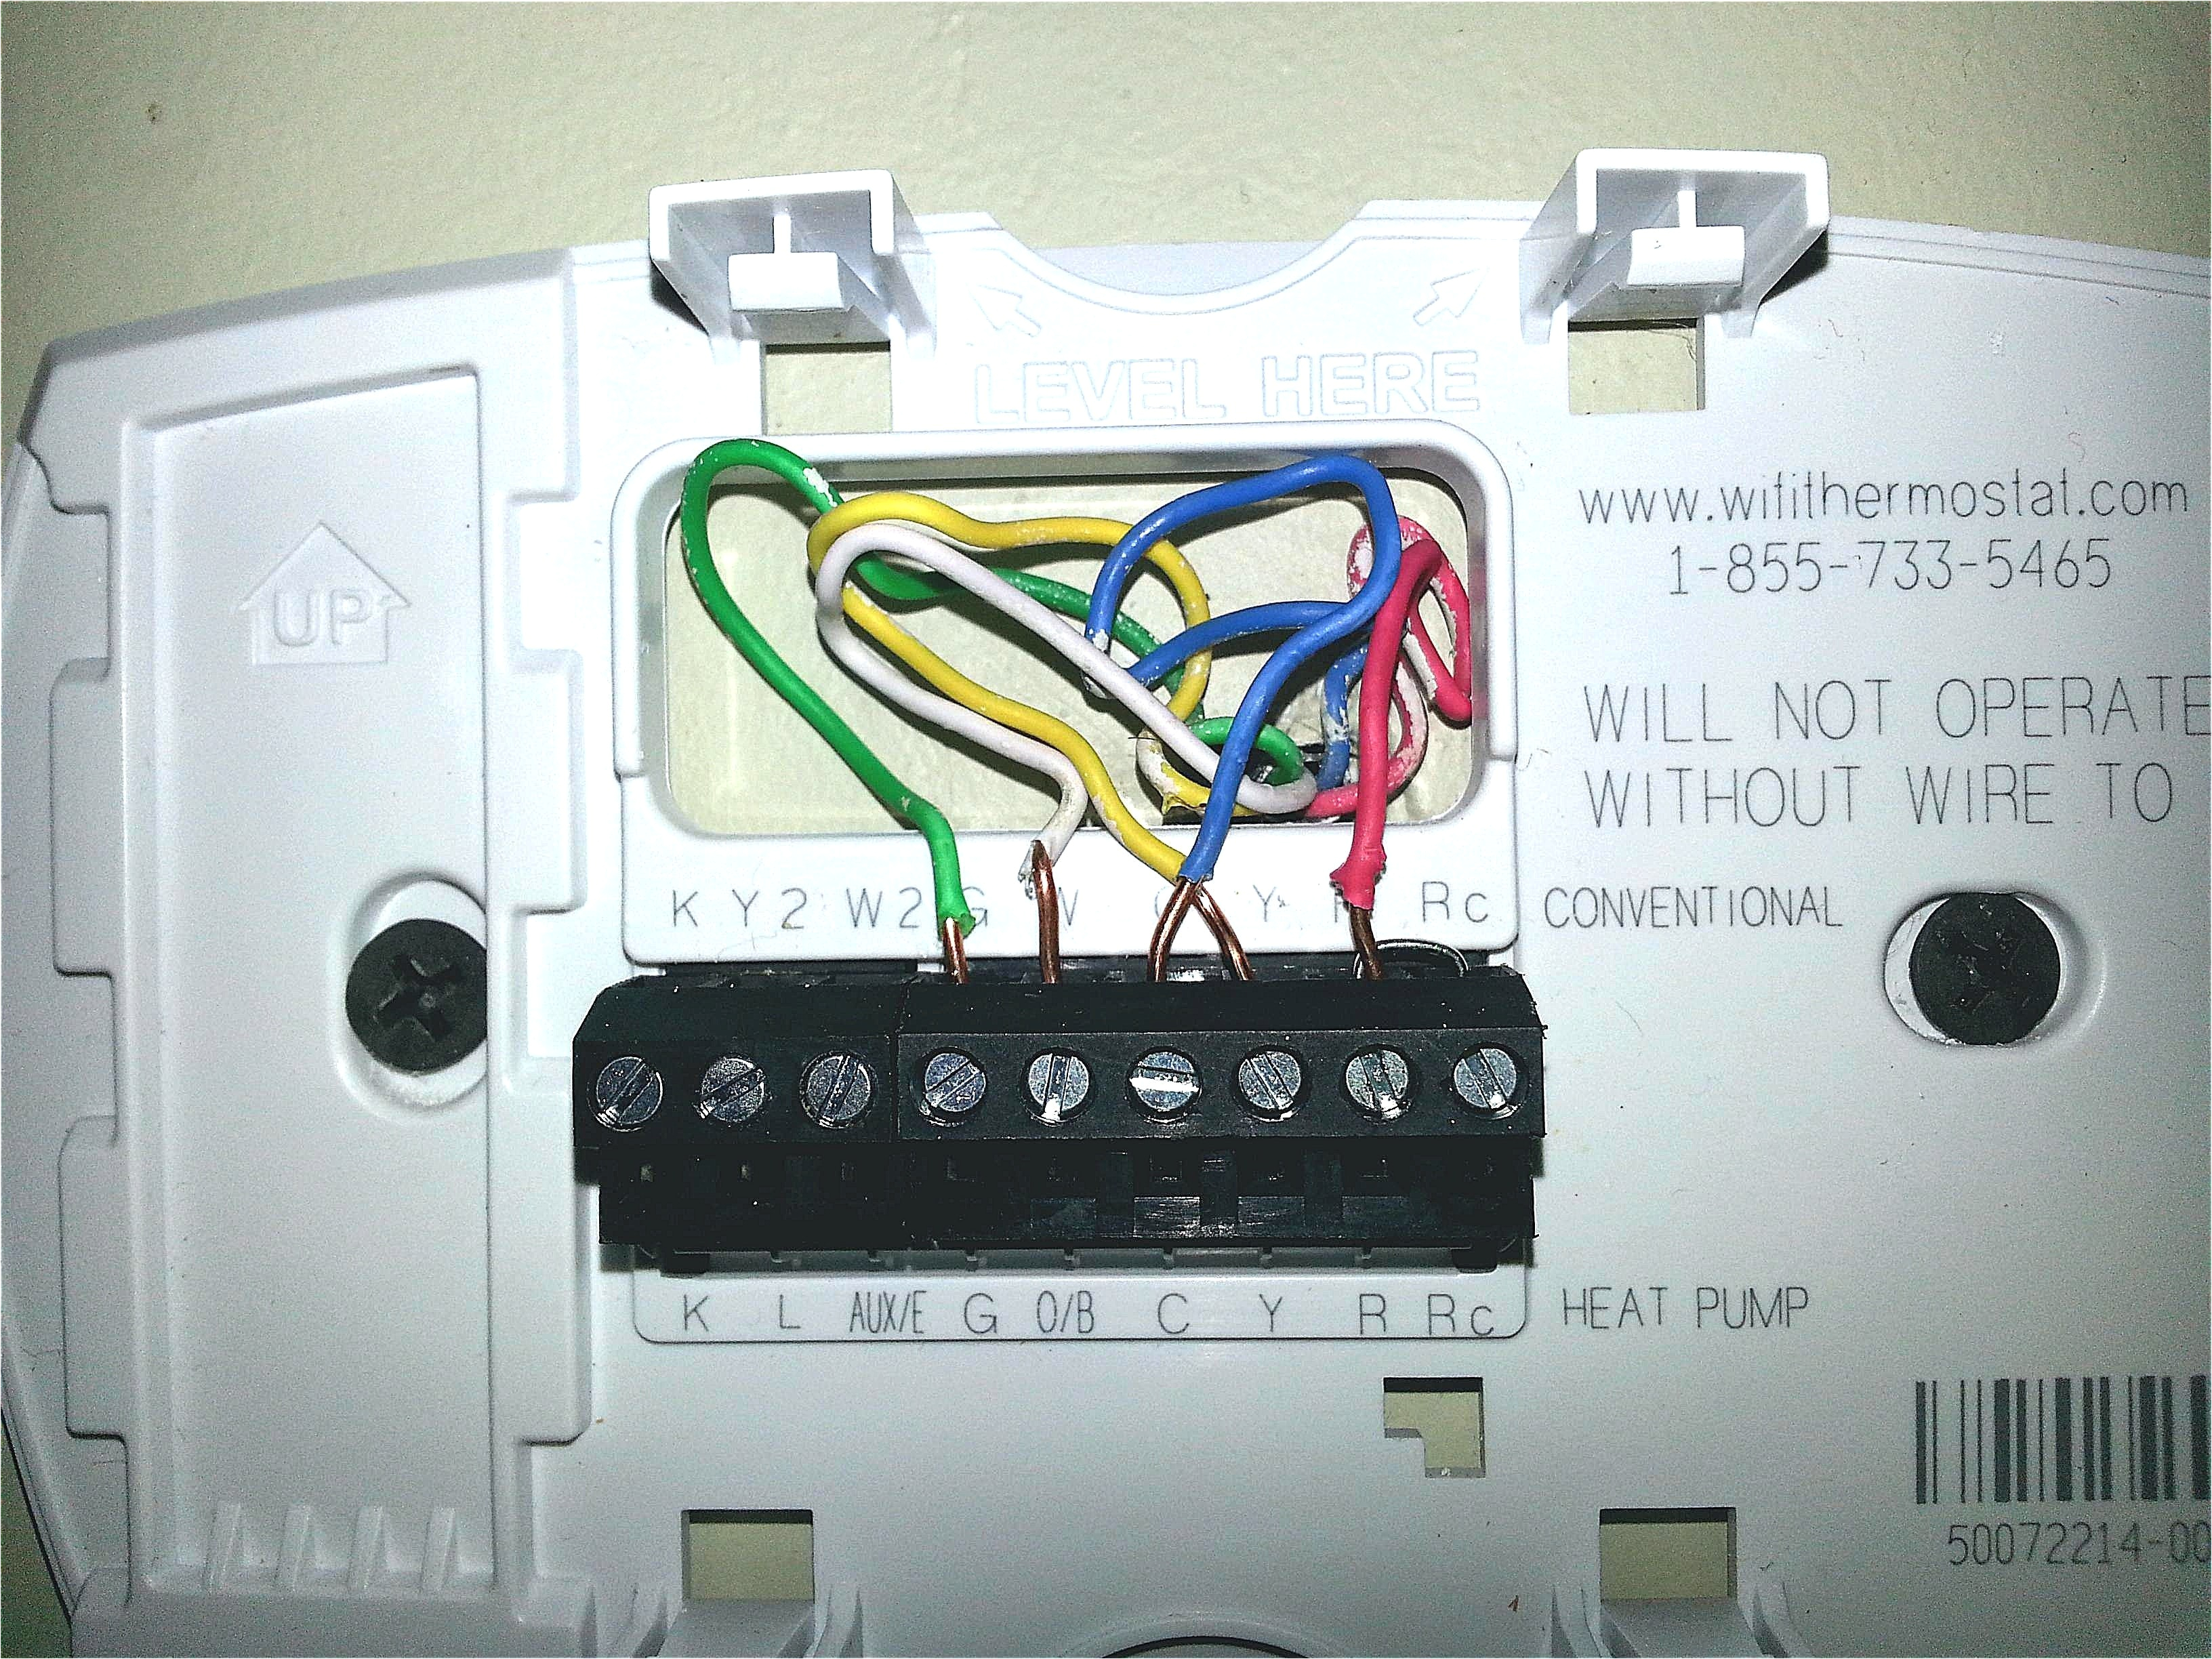 wiring diagram on honeywell heat pump thermostat wiring rth6580wf honeywell rth6580wf thermostat wiring diagram honeywell rth6580wf wiring diagram